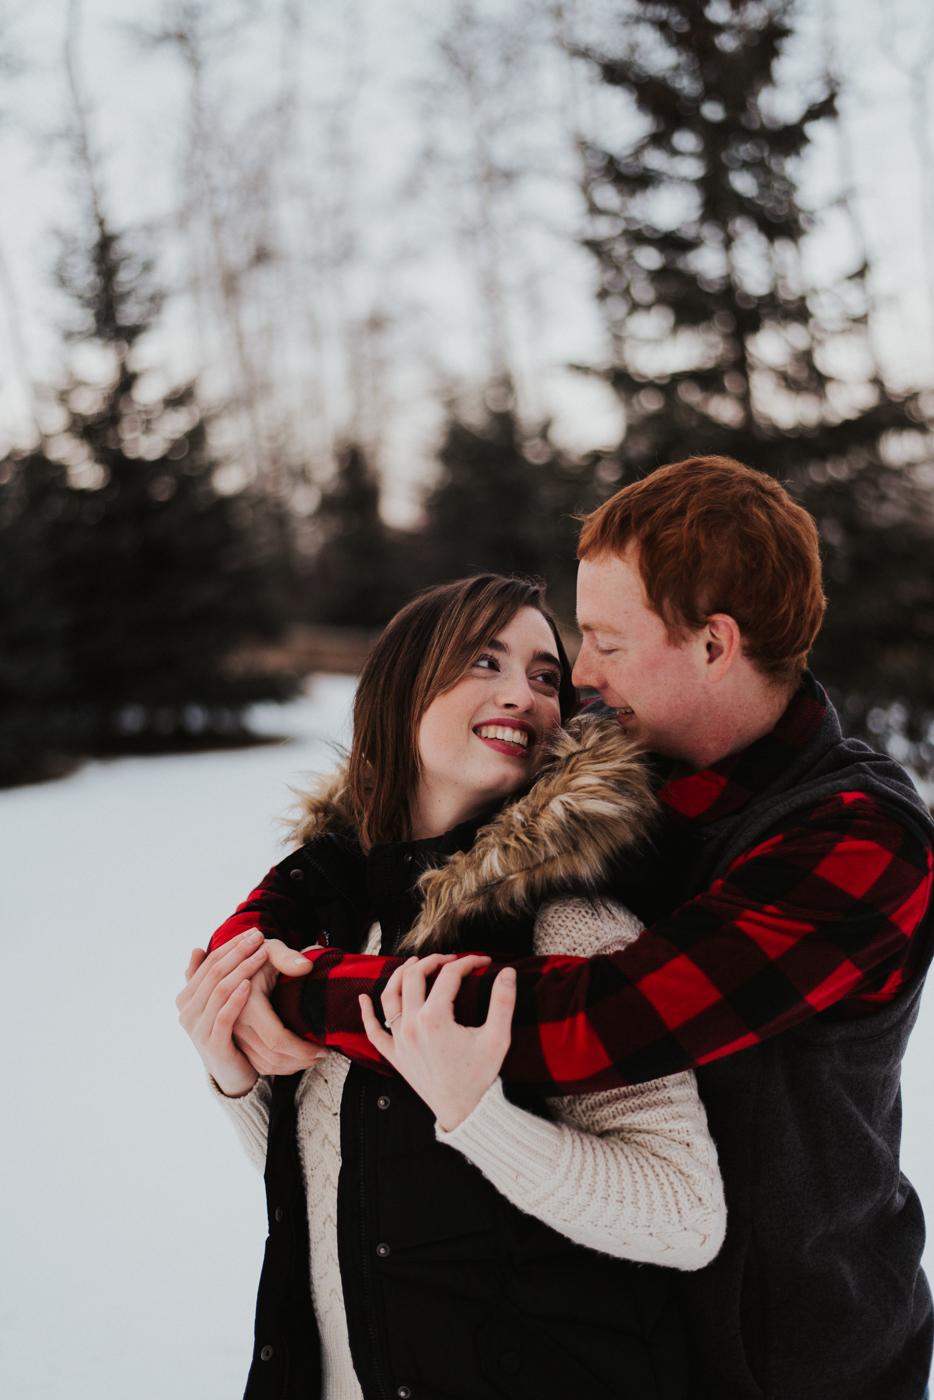 FortSt.John_photographer_TyraEPhotography_Wedding_Couple_Family_Photograhy_DawsonCreek_Elopement_Bride_Boduoir_Portraits-7615.jpg